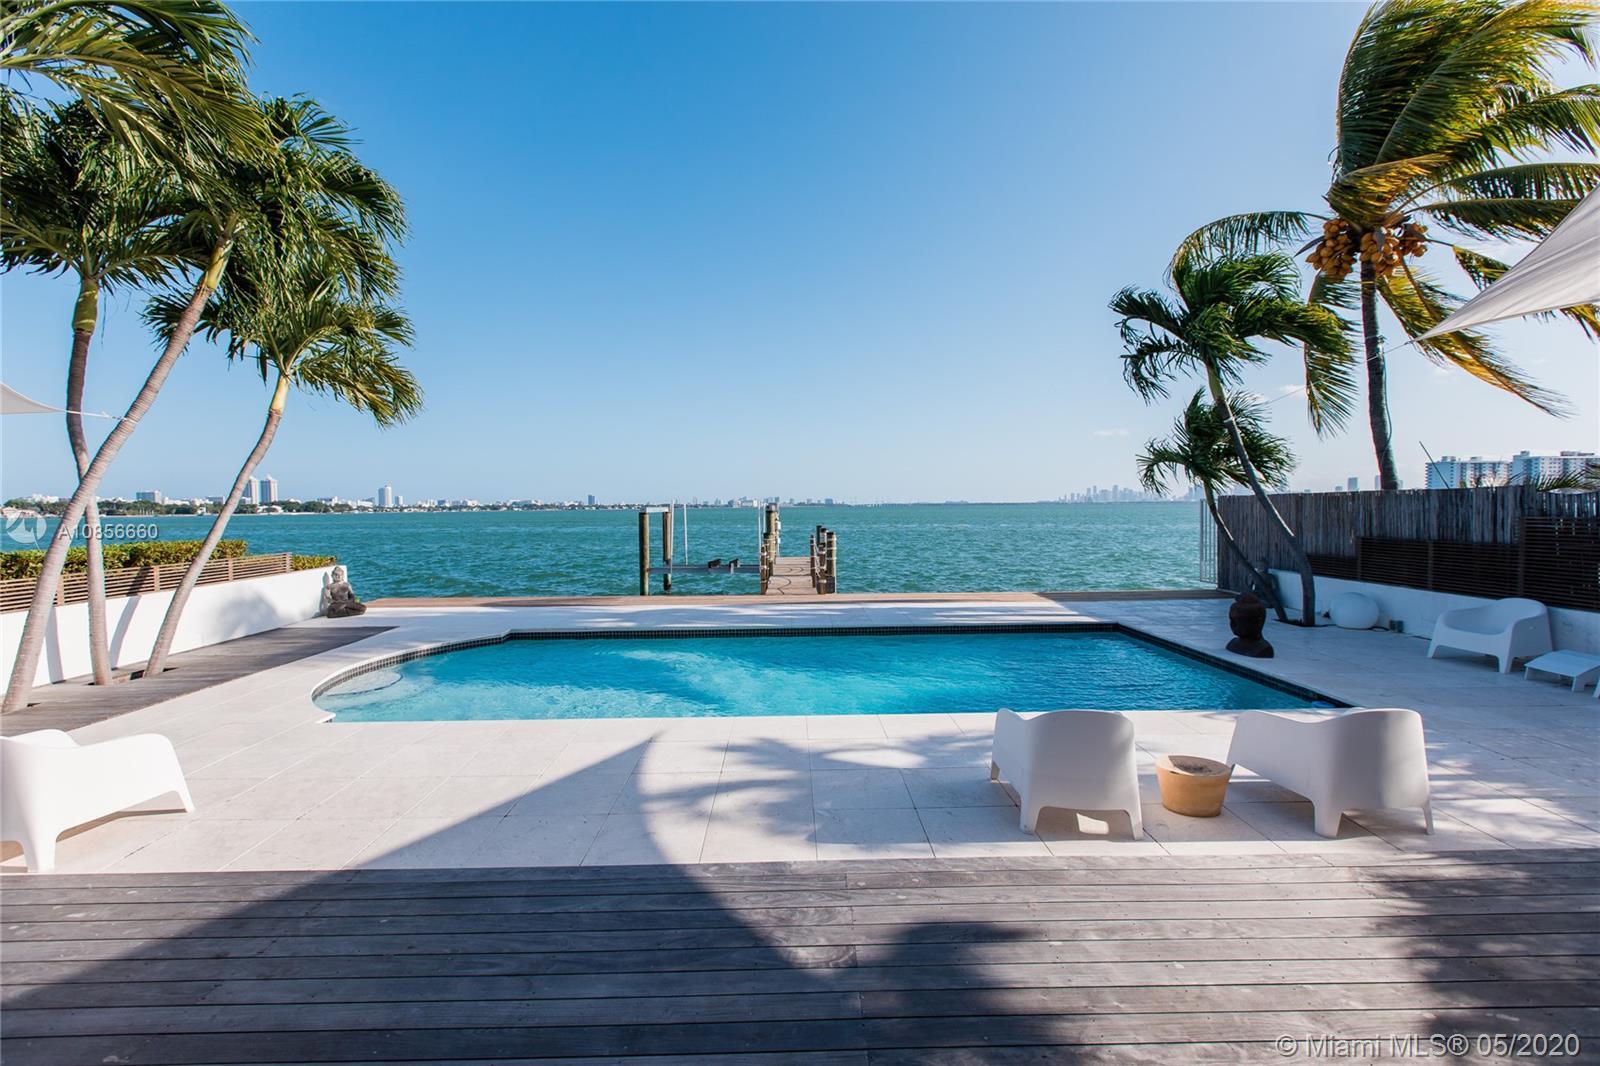 Isle of Normandy - 1850 Bay Dr, Miami Beach, FL 33141